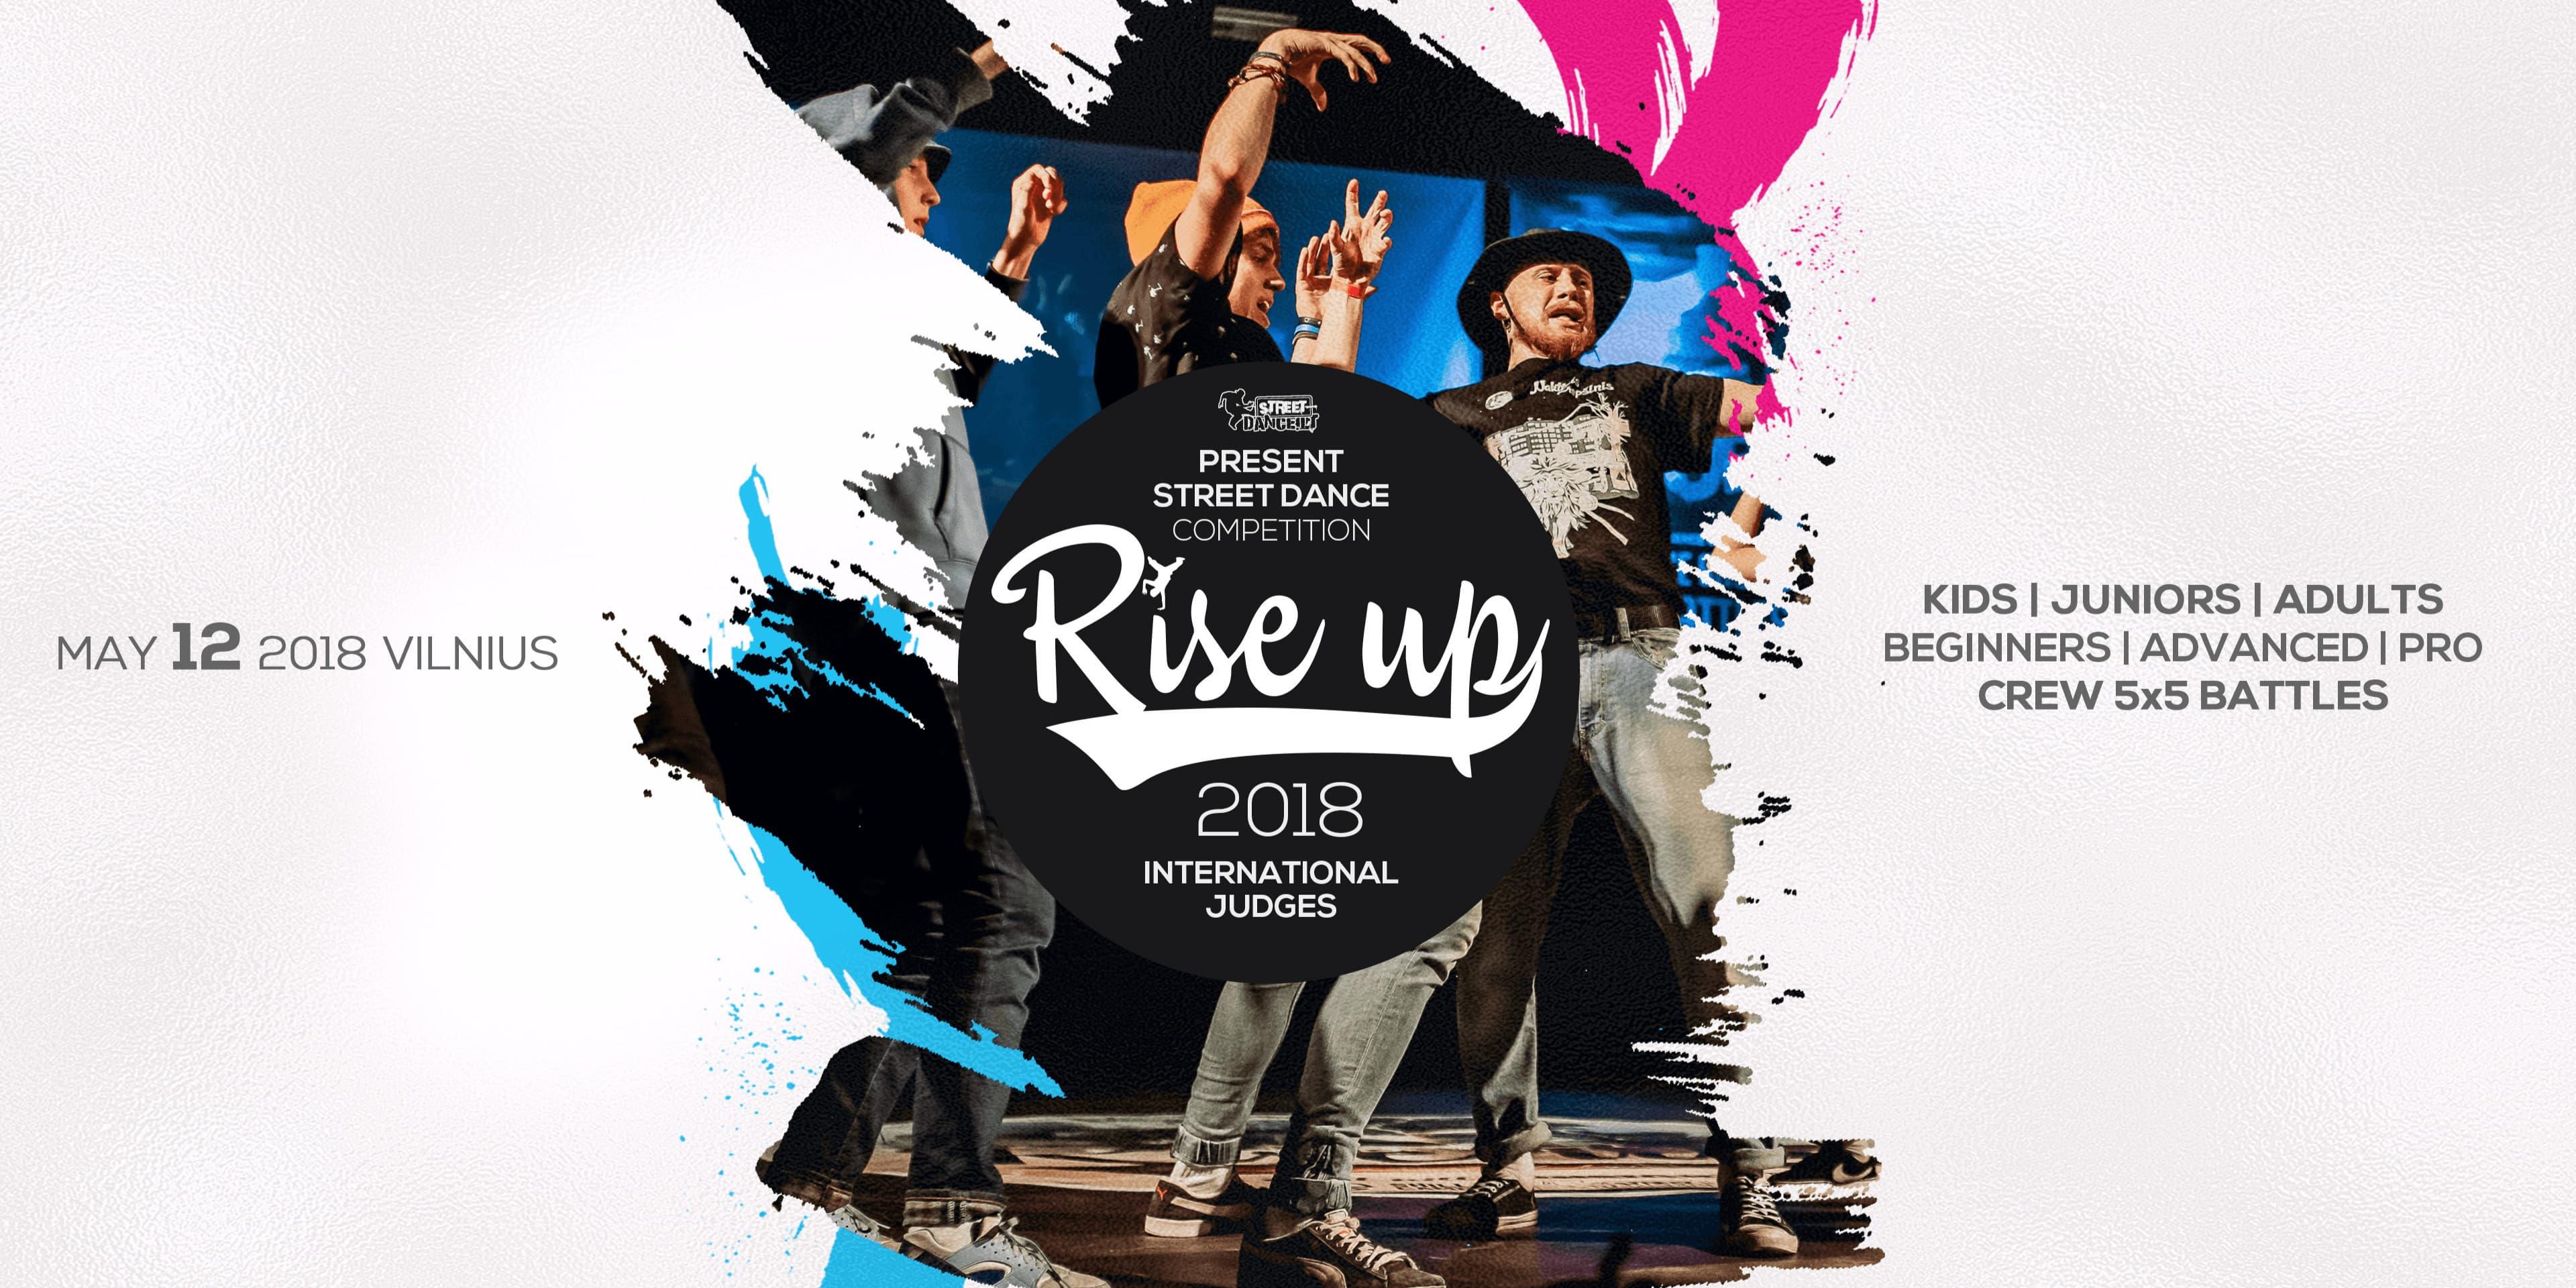 RISE UP 2018 Street dance varžybos